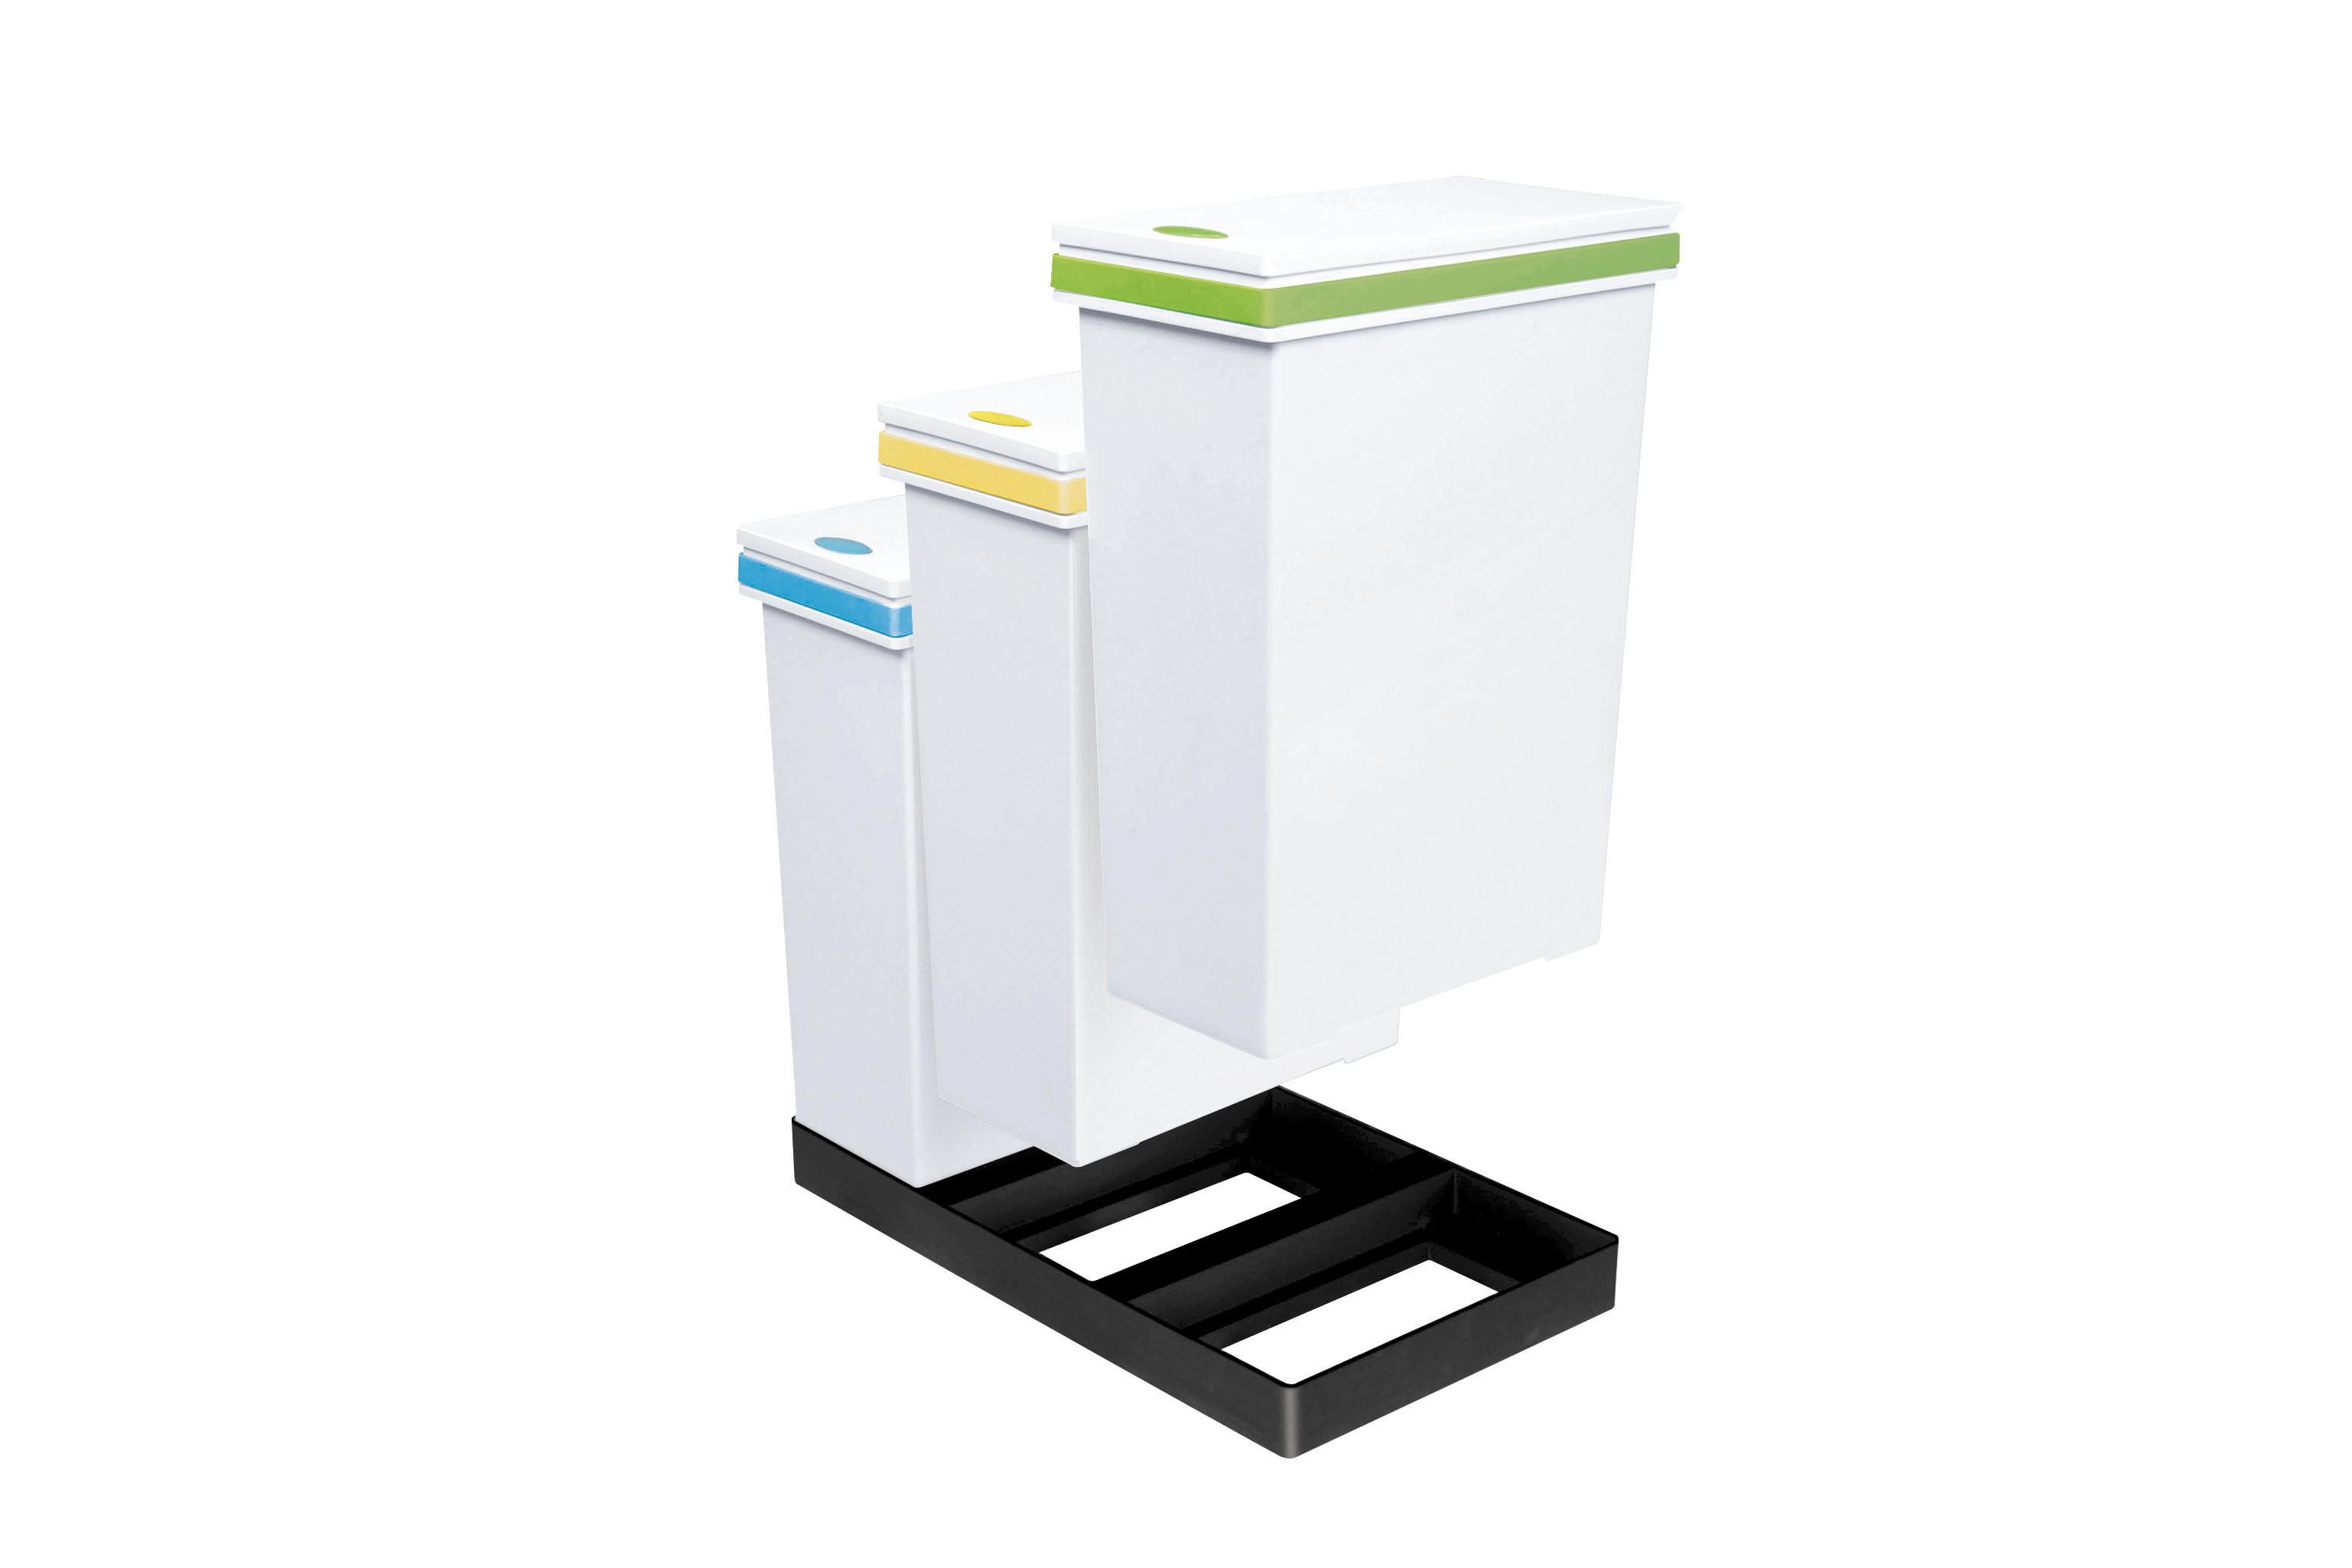 Waste Separation System